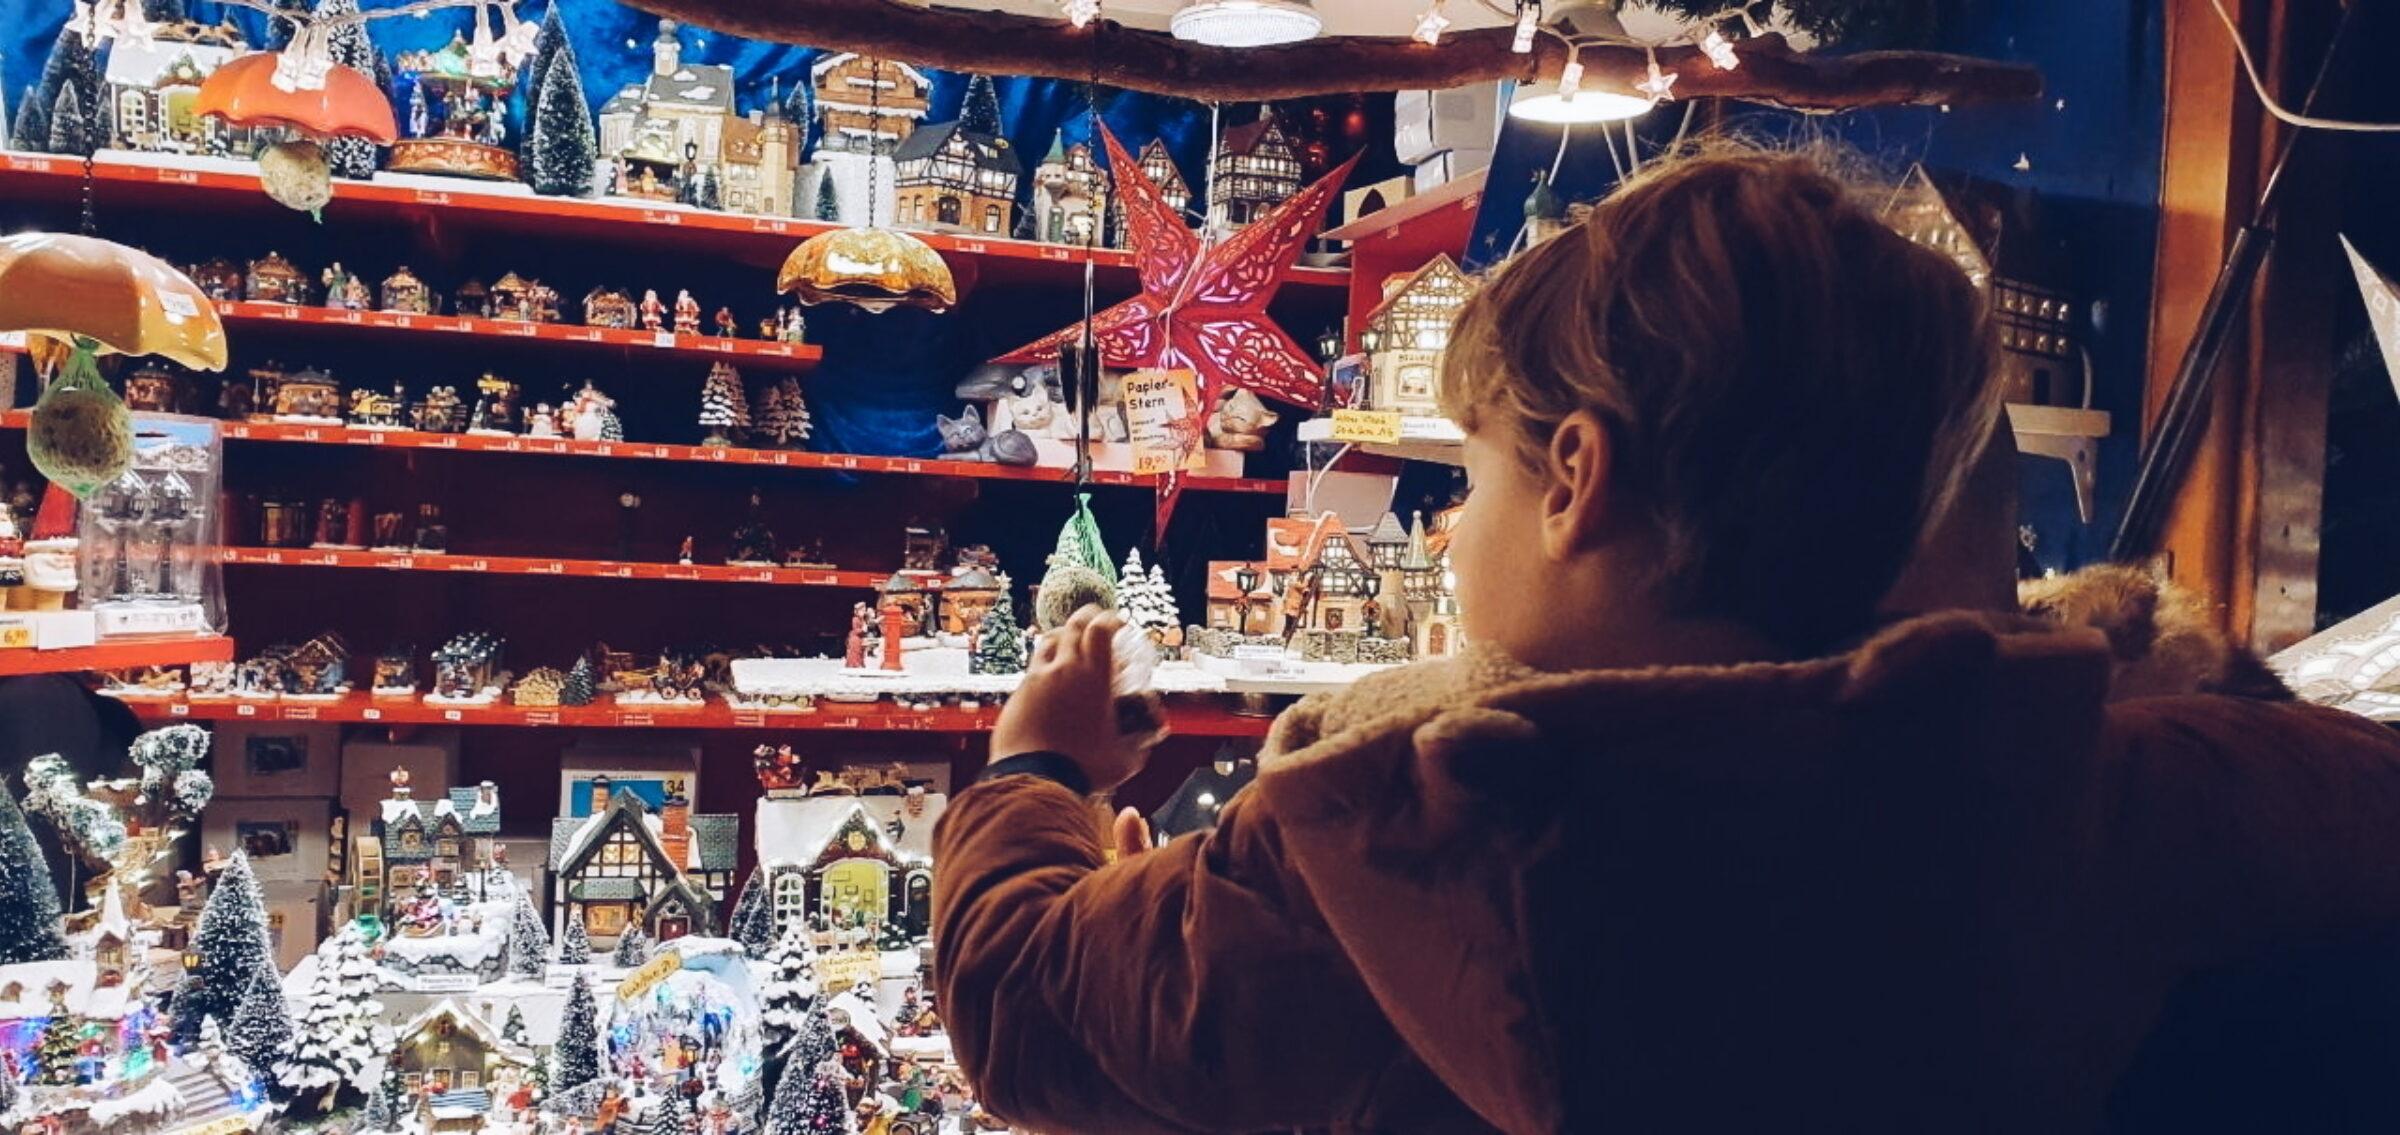 Kraampje kerstmarkt Osnabruck